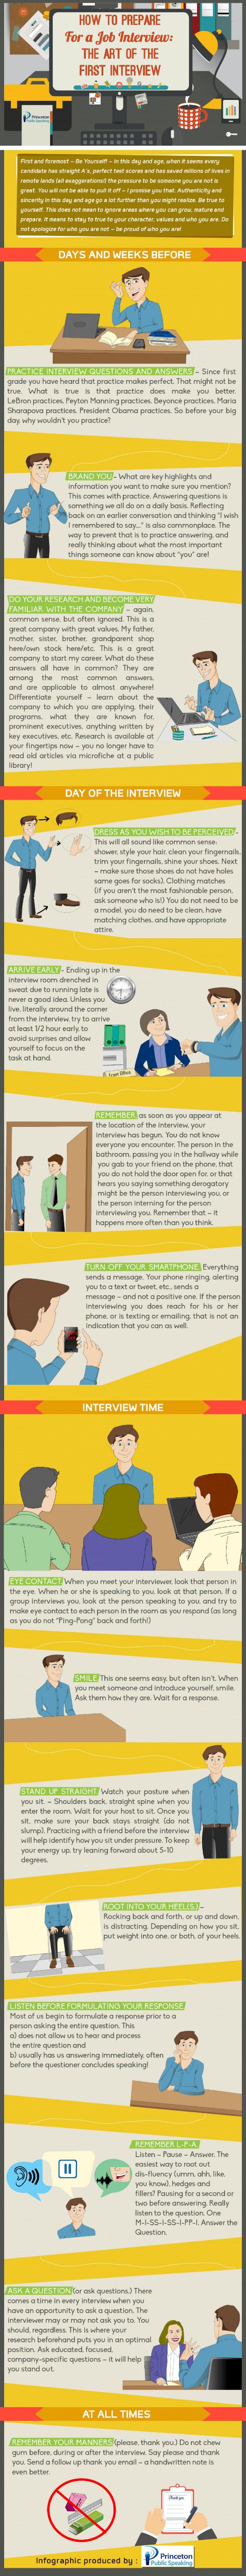 Rock Your Next Job Interview